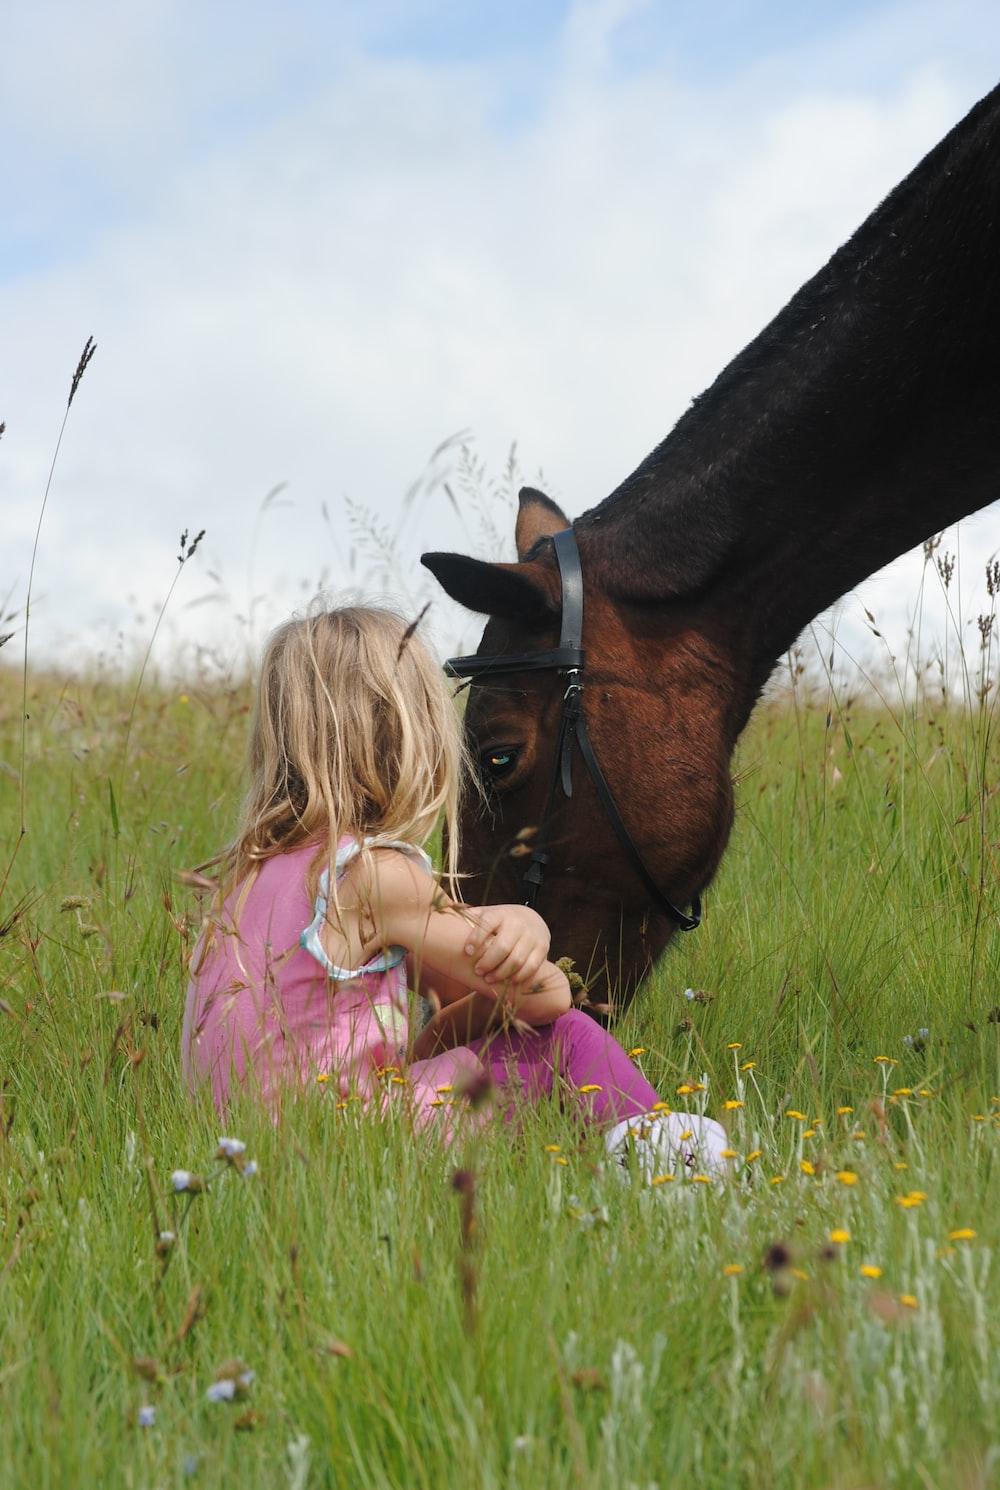 kid sitting beside brown horse during daytime